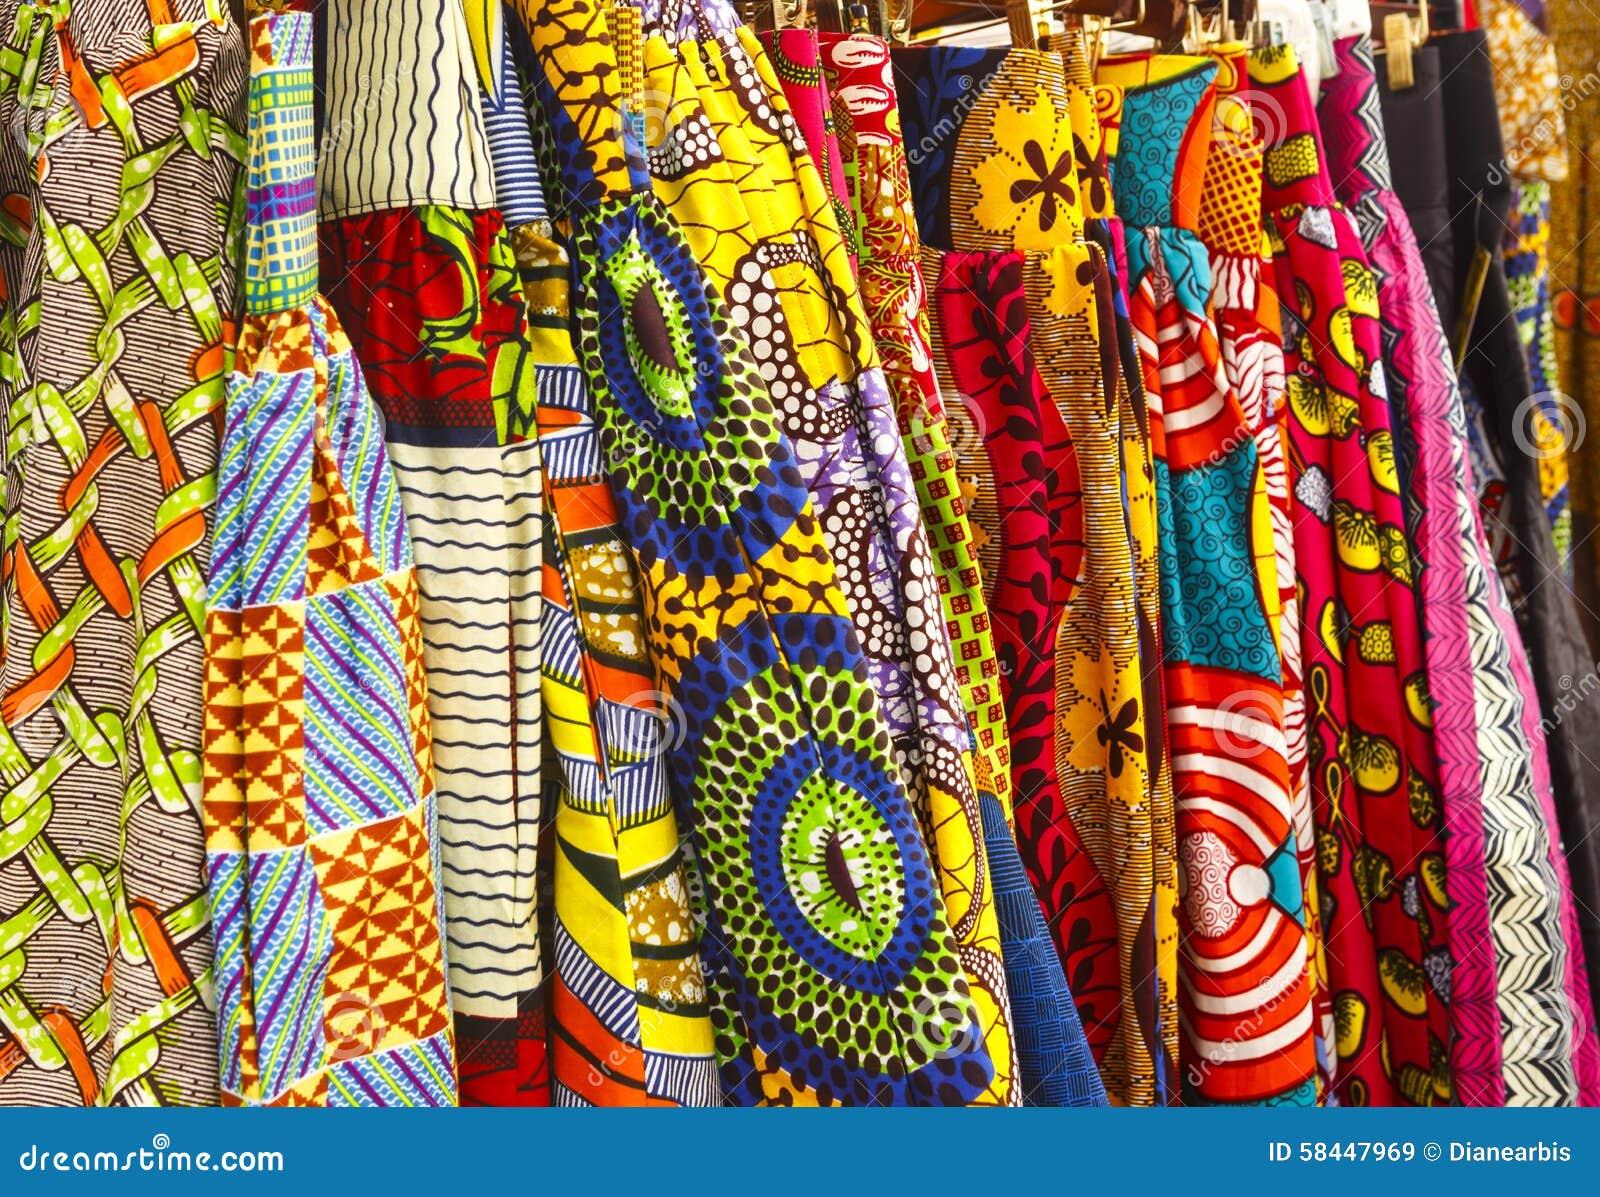 African Fabric Stock Image. Image Of Horizontal, Design